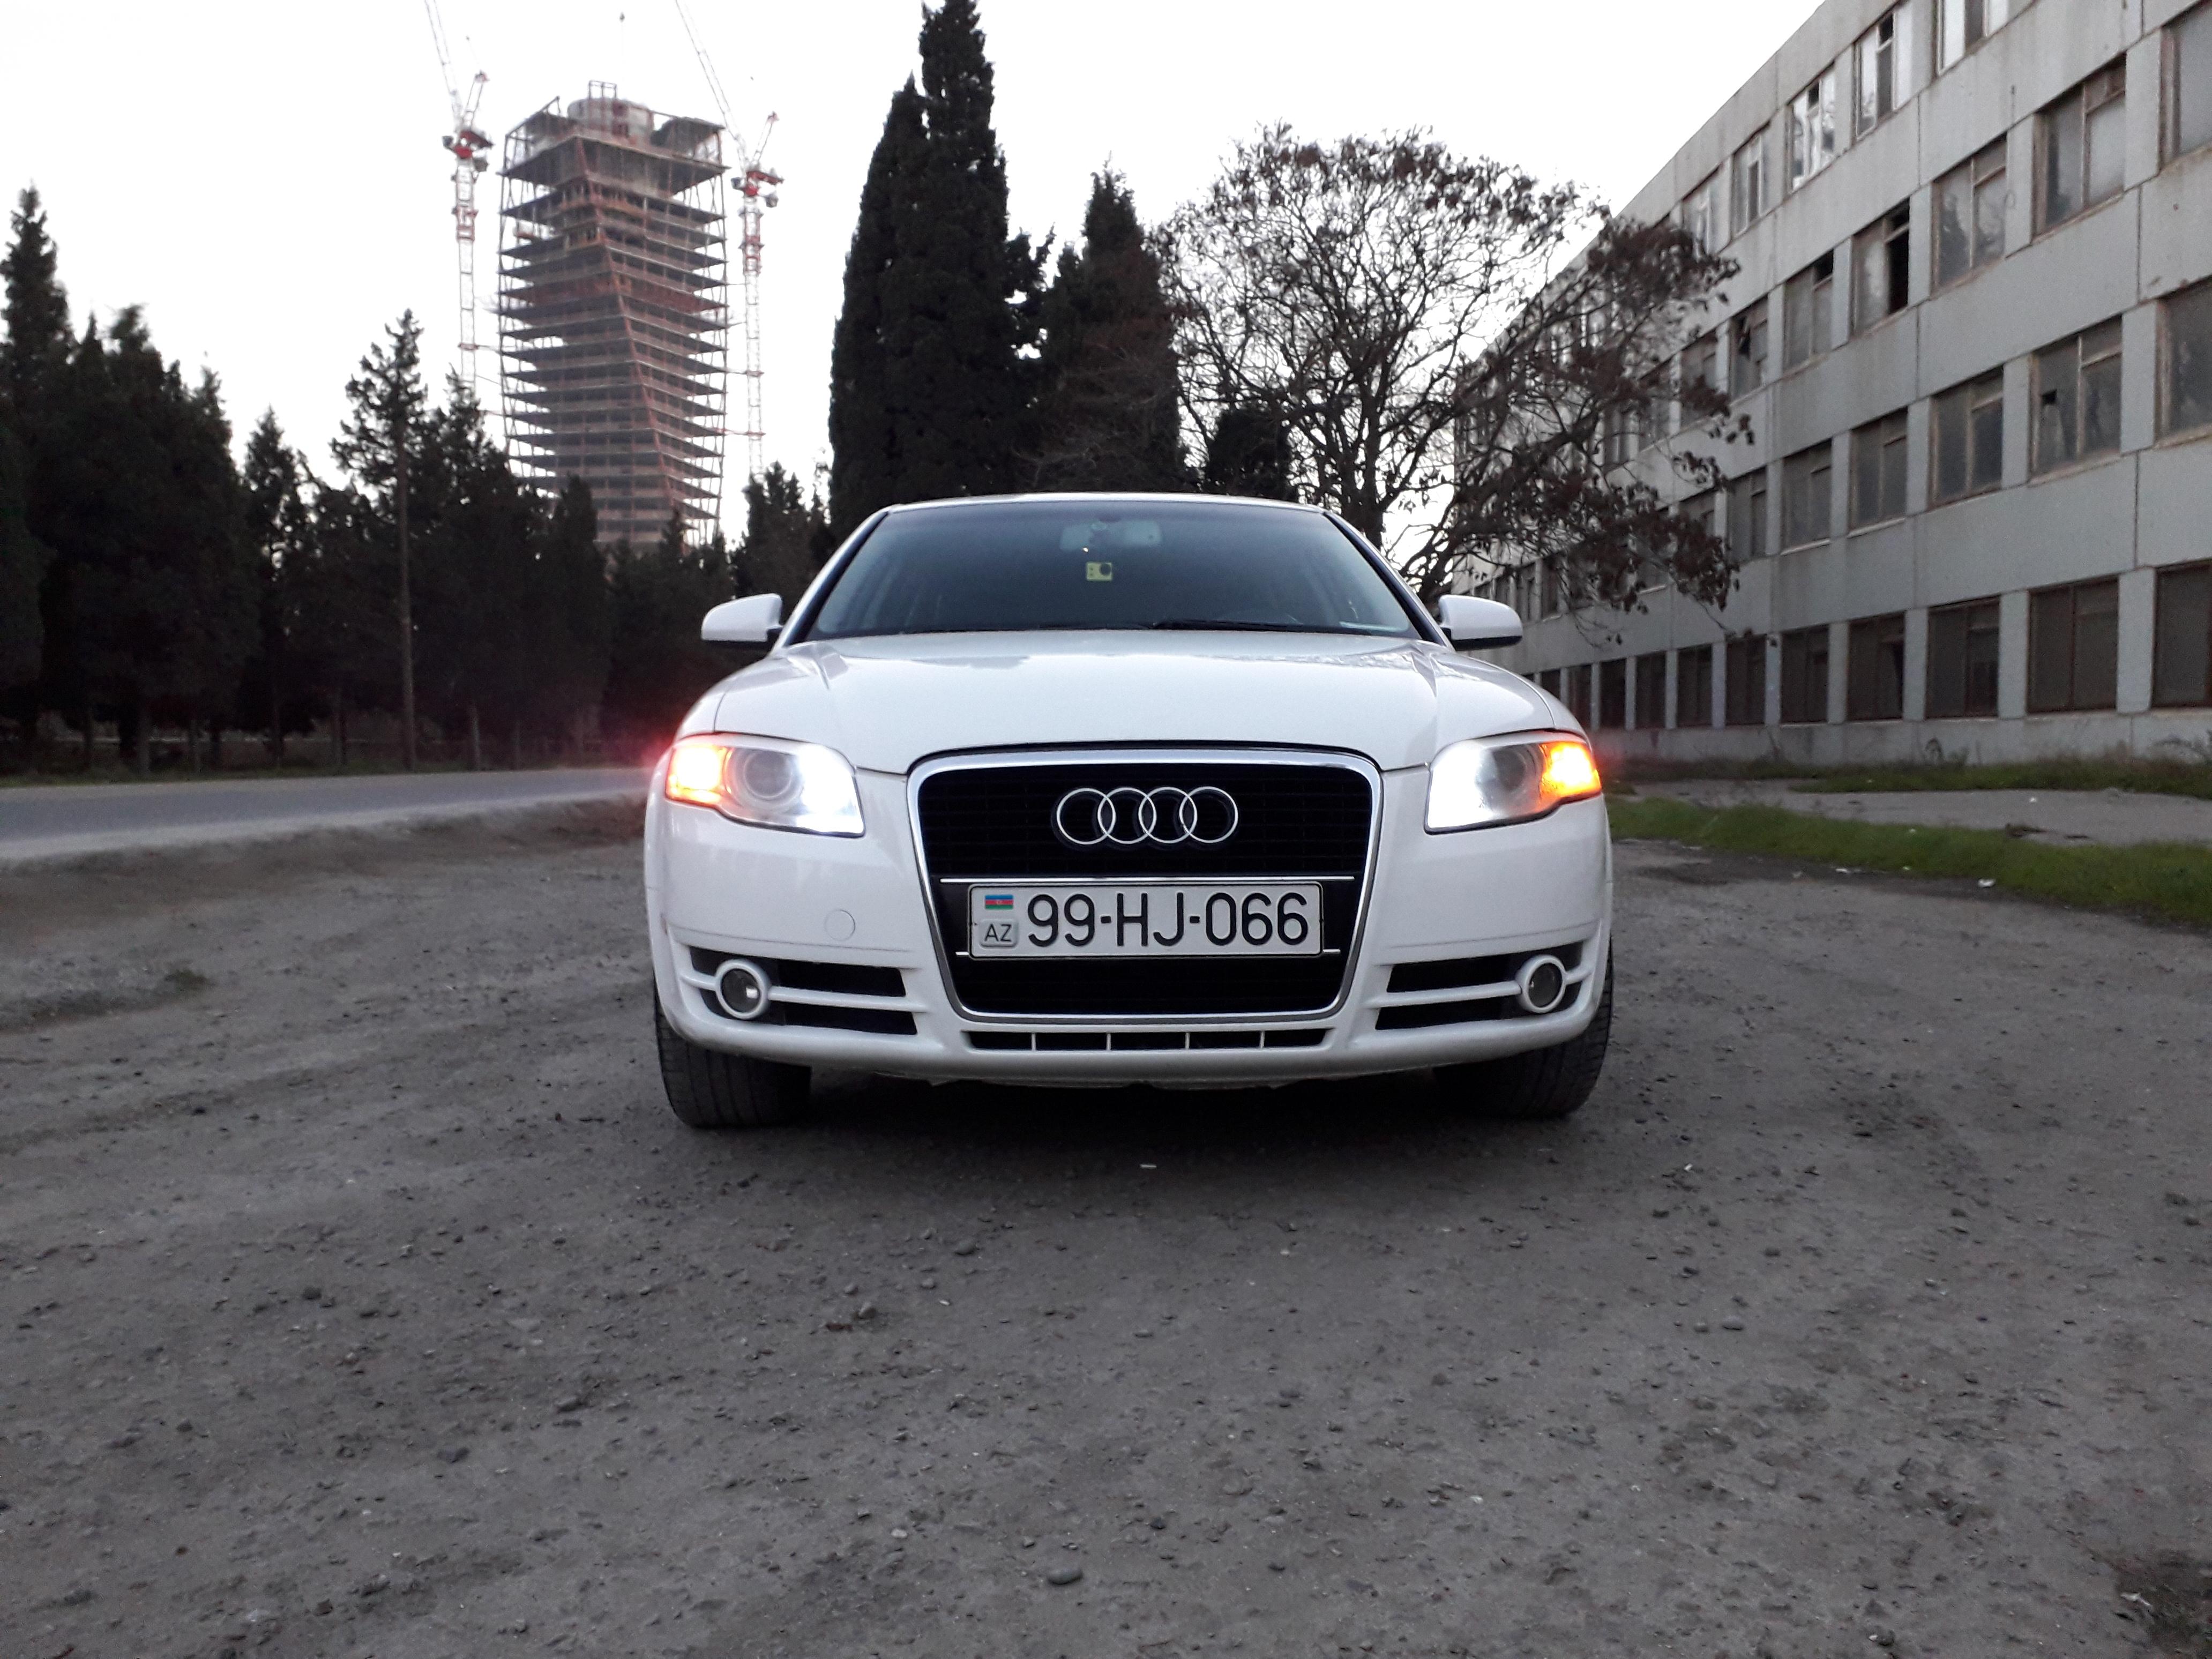 Audi A4 2.0(lt) 2007 Second hand  $7530